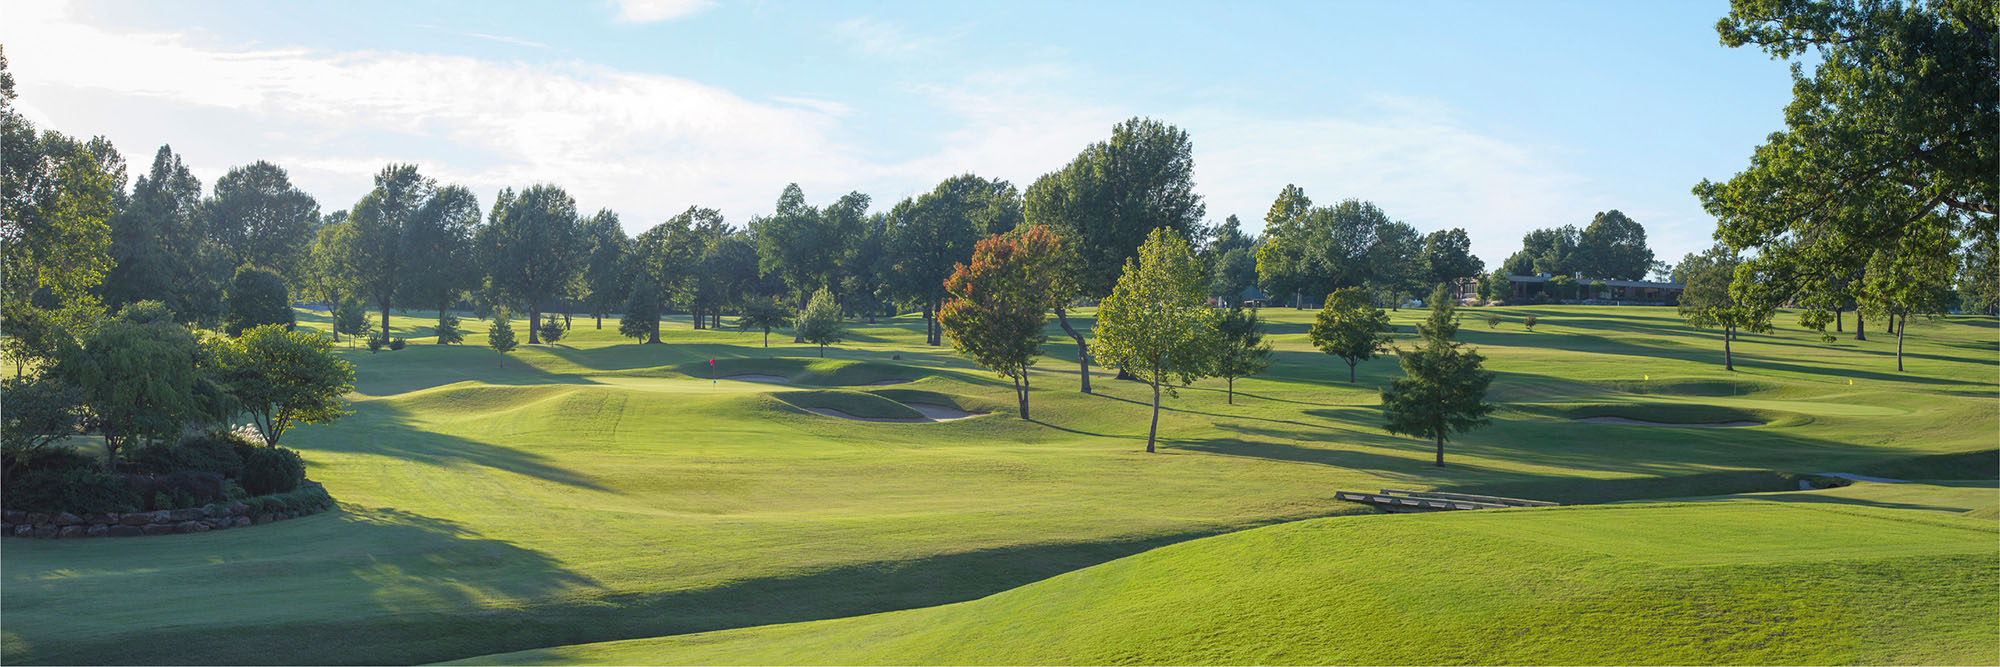 Golf Course Image - Tulsa Country Club No. 9